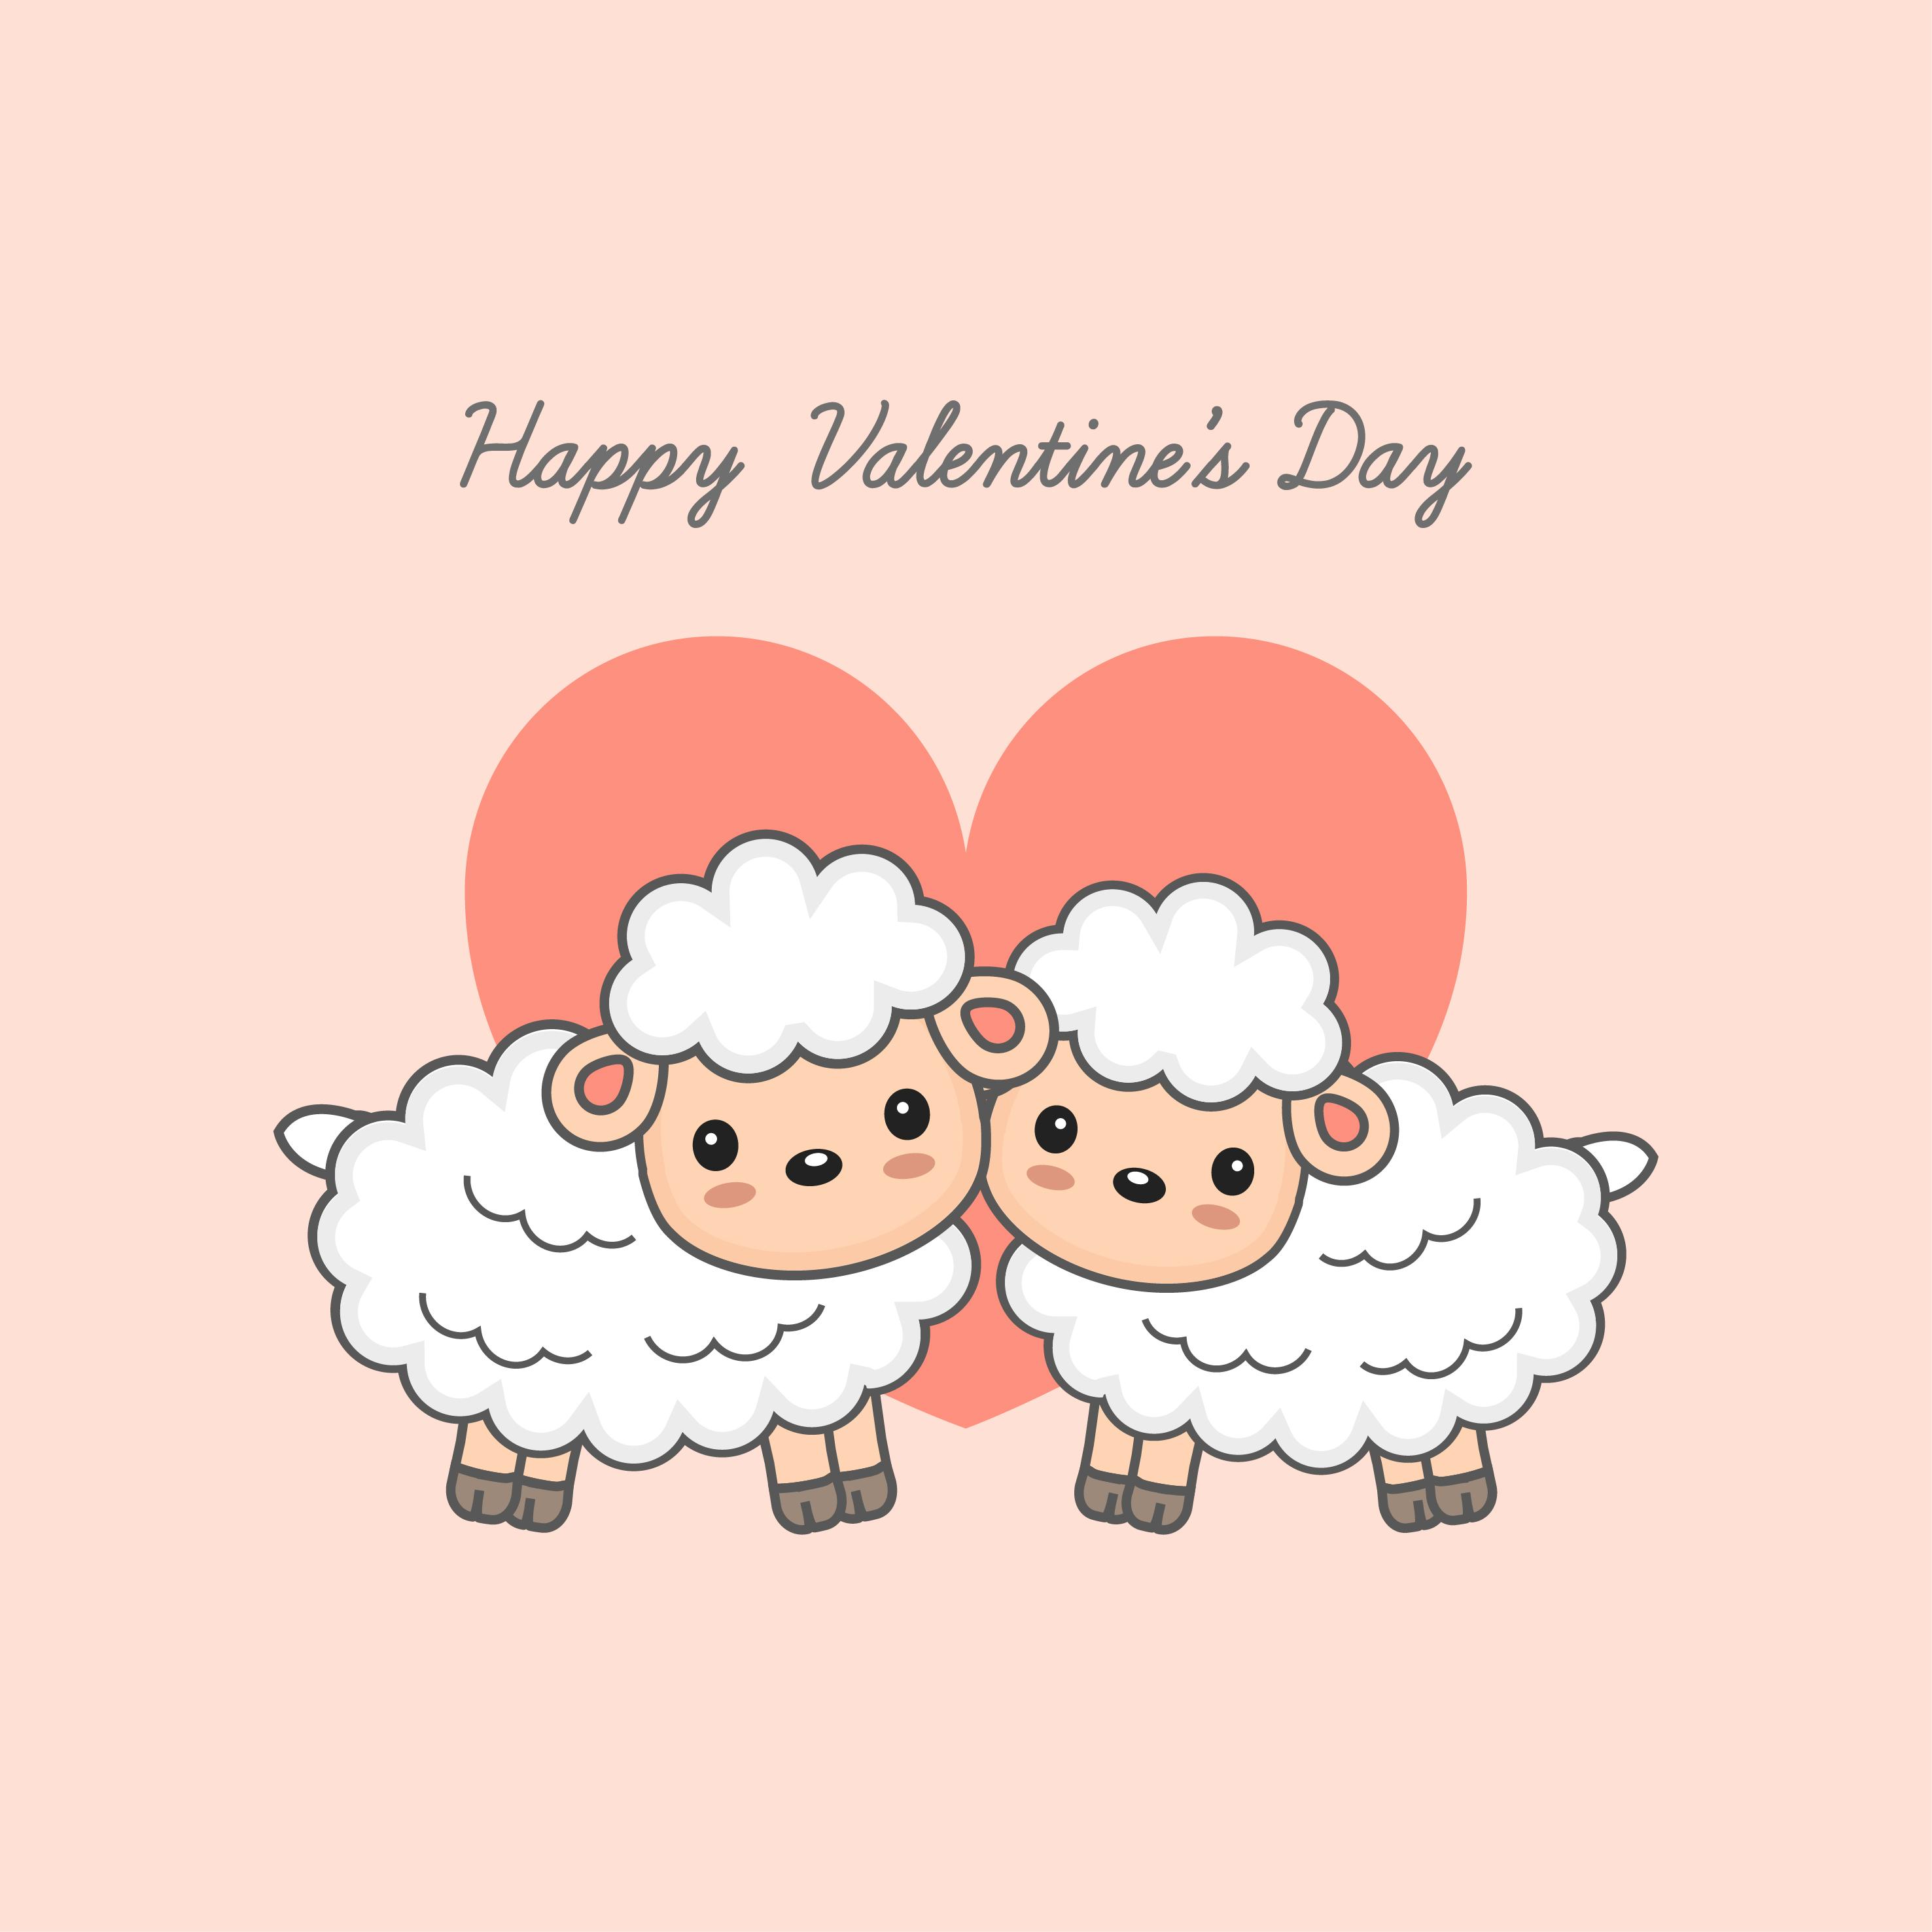 Feliz Dia De San Valentin Postal Pareja De Ovejas Dulces